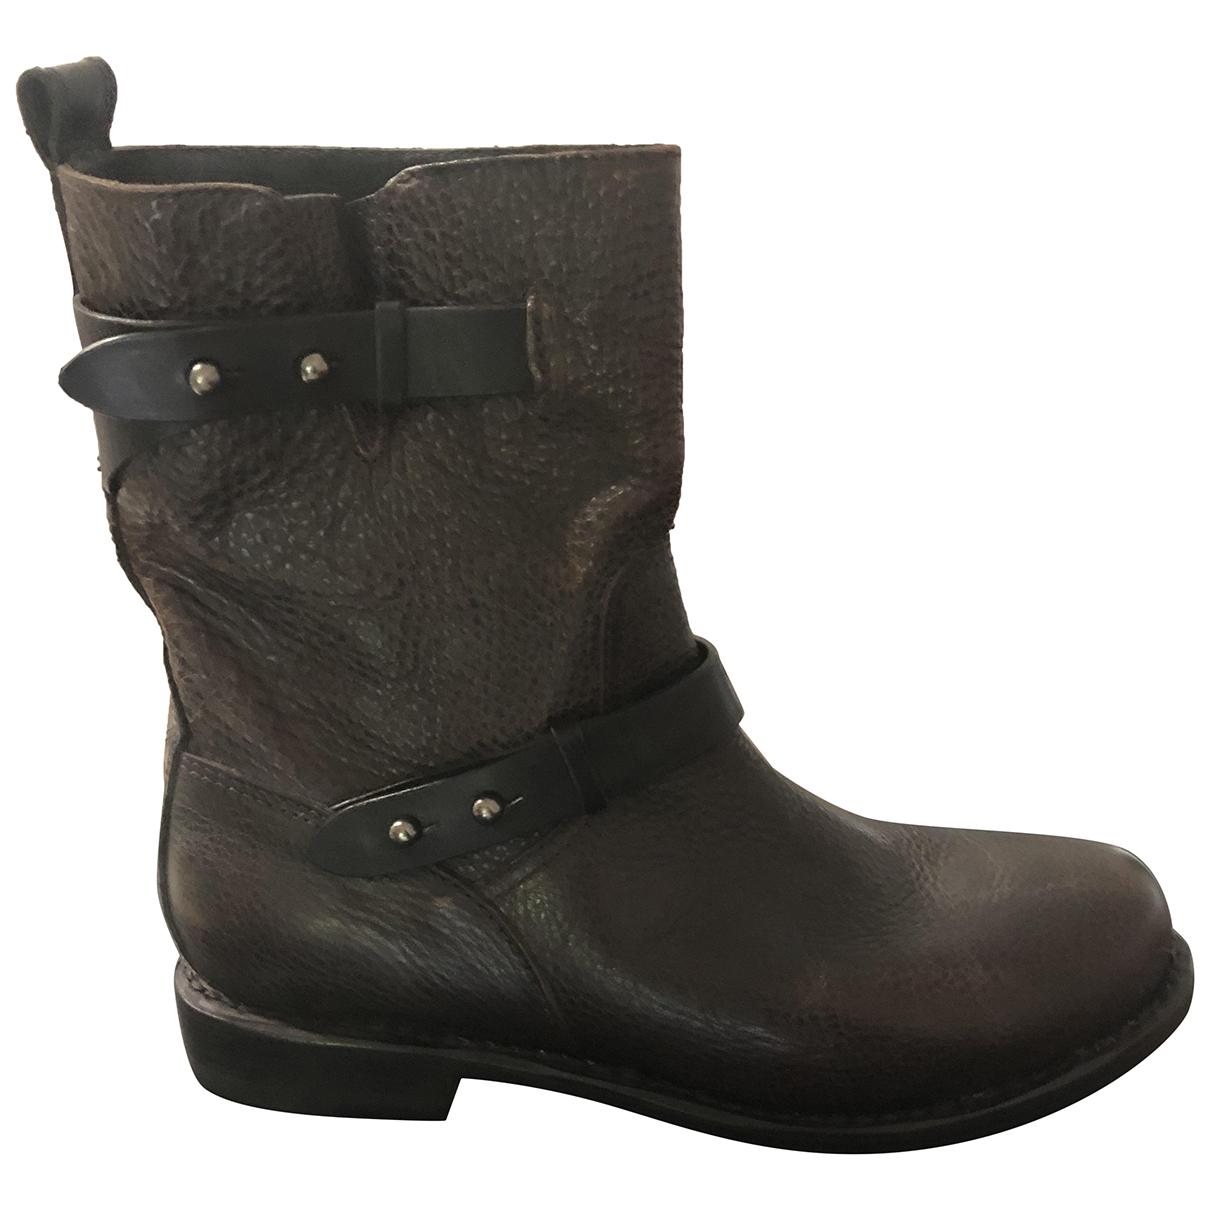 Rag & Bone N Brown Leather Boots for Women 39 EU